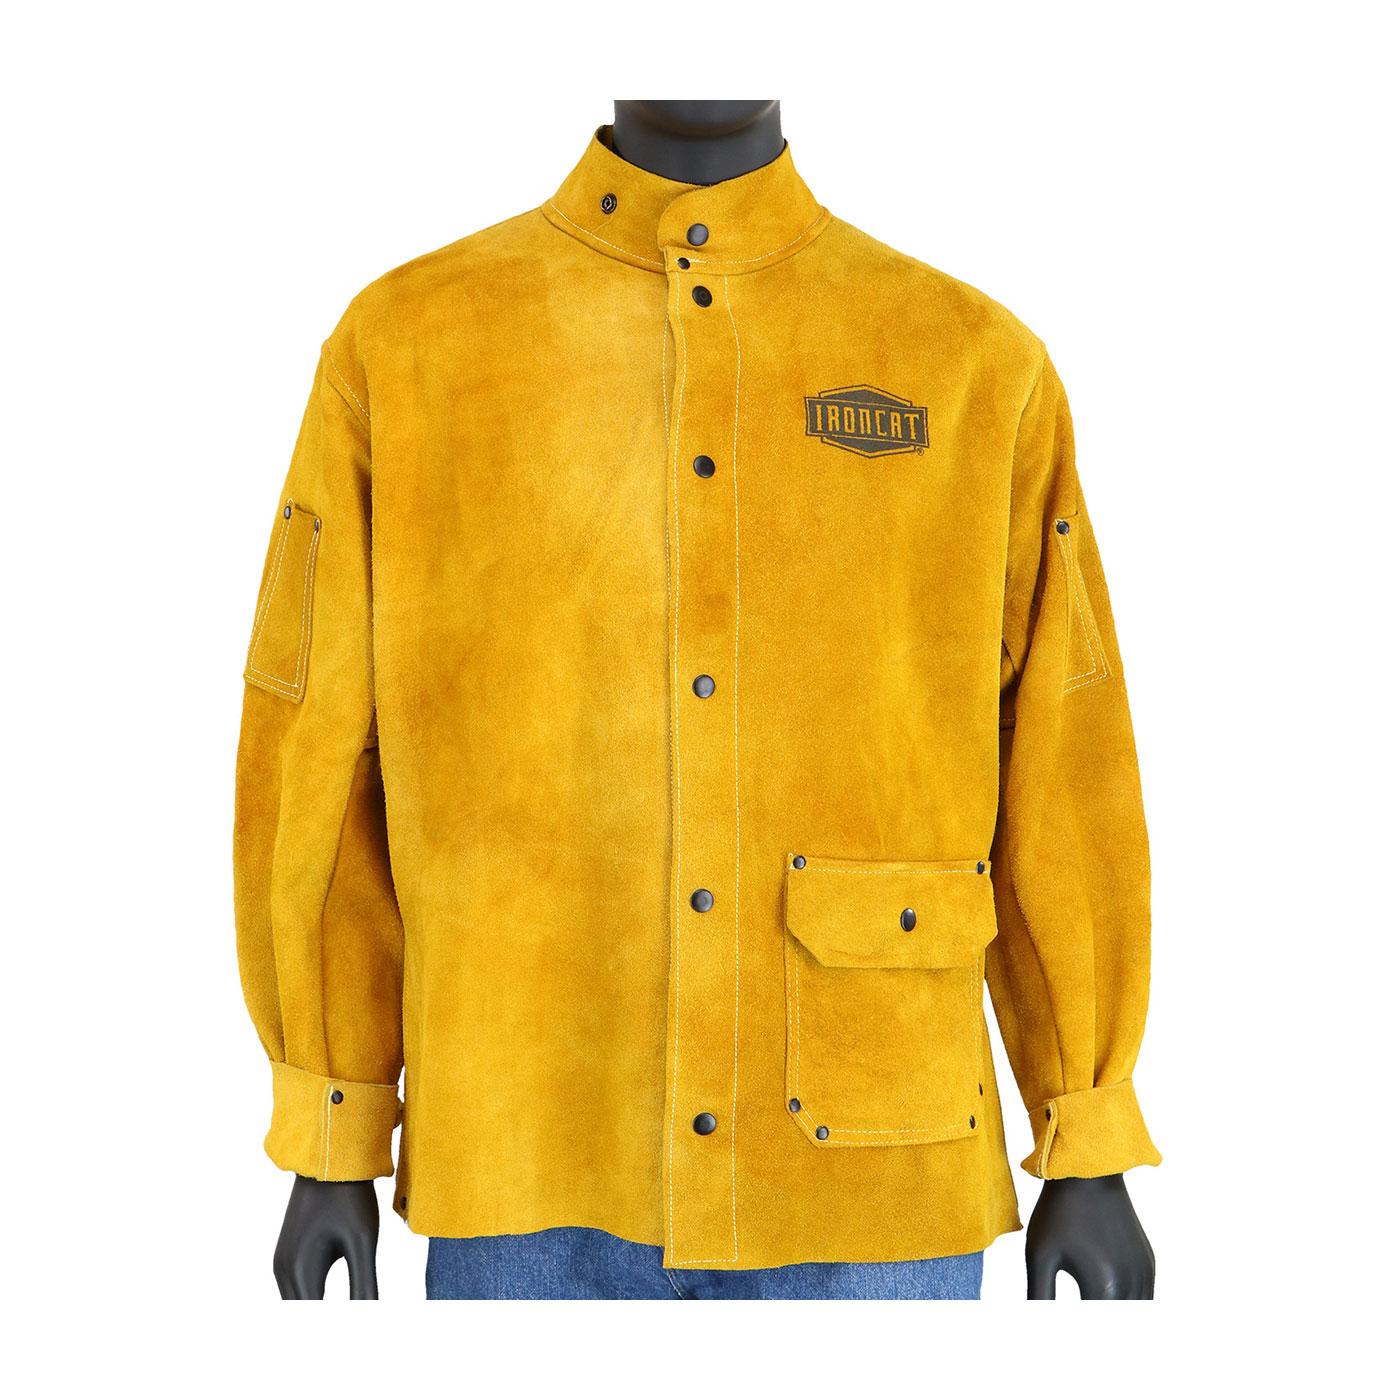 Ironcat® Split Leather Welding Jacket, Gold, 2XL